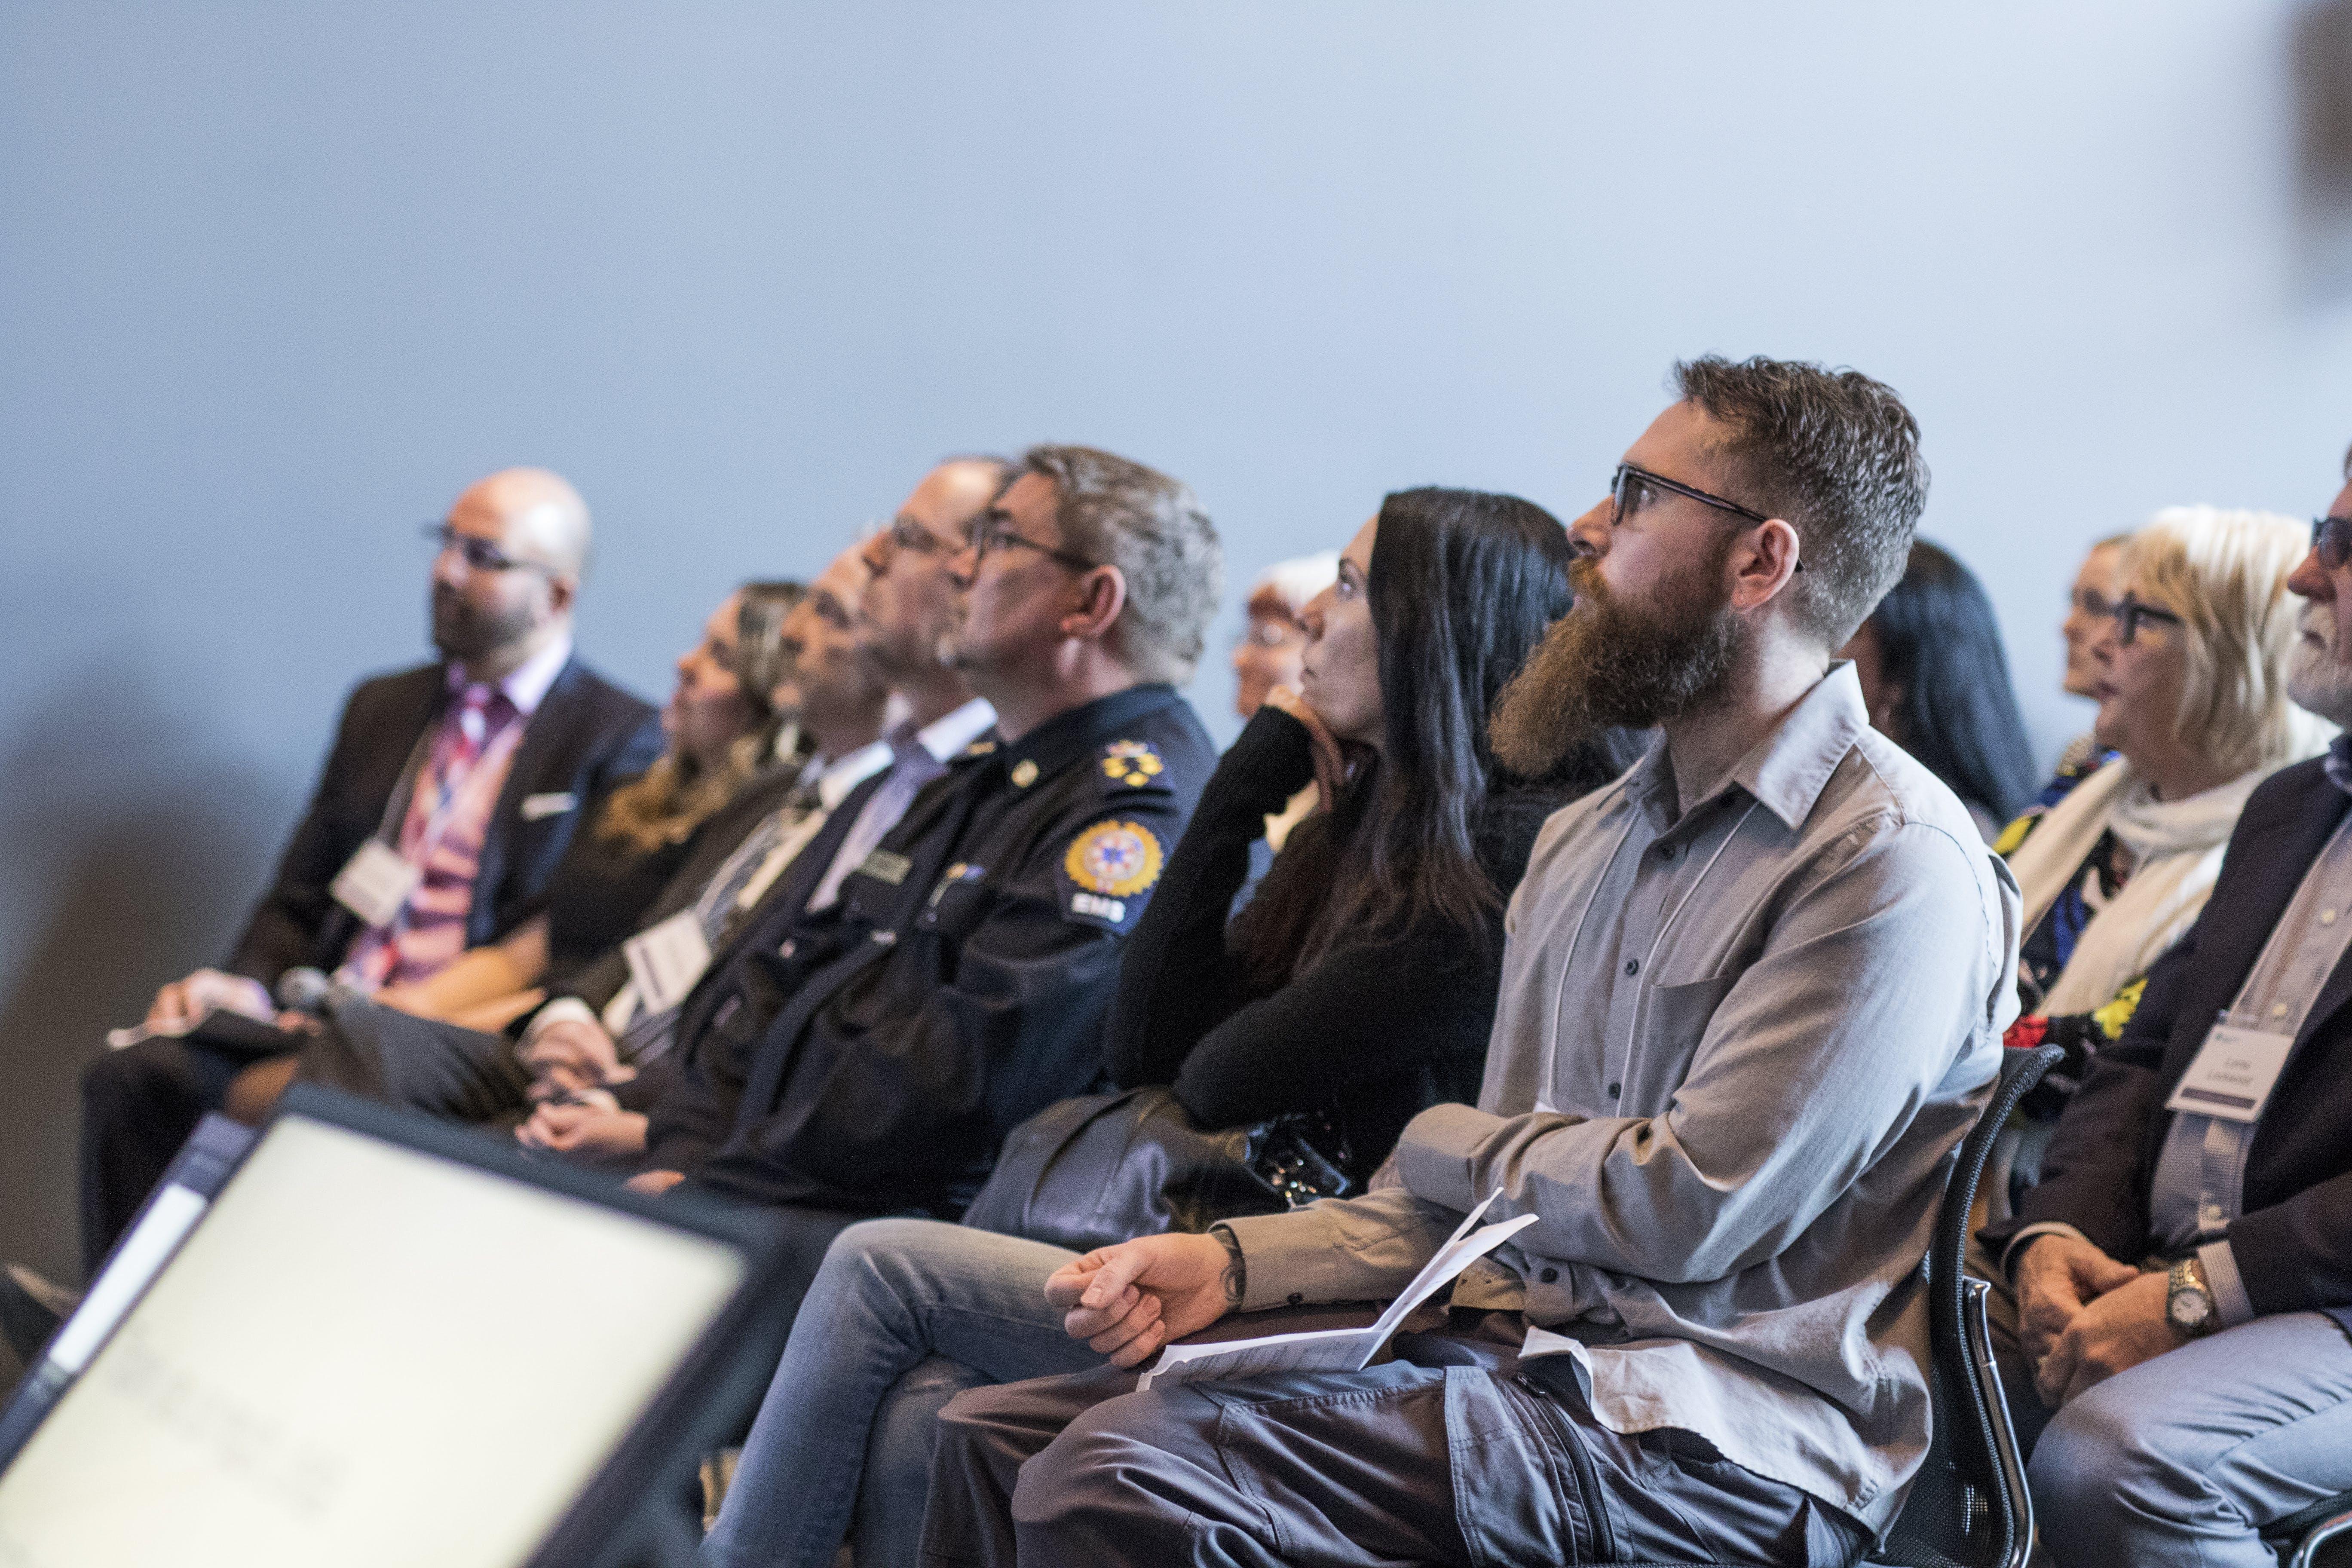 A Conversation with Yiu - Edmonton Event